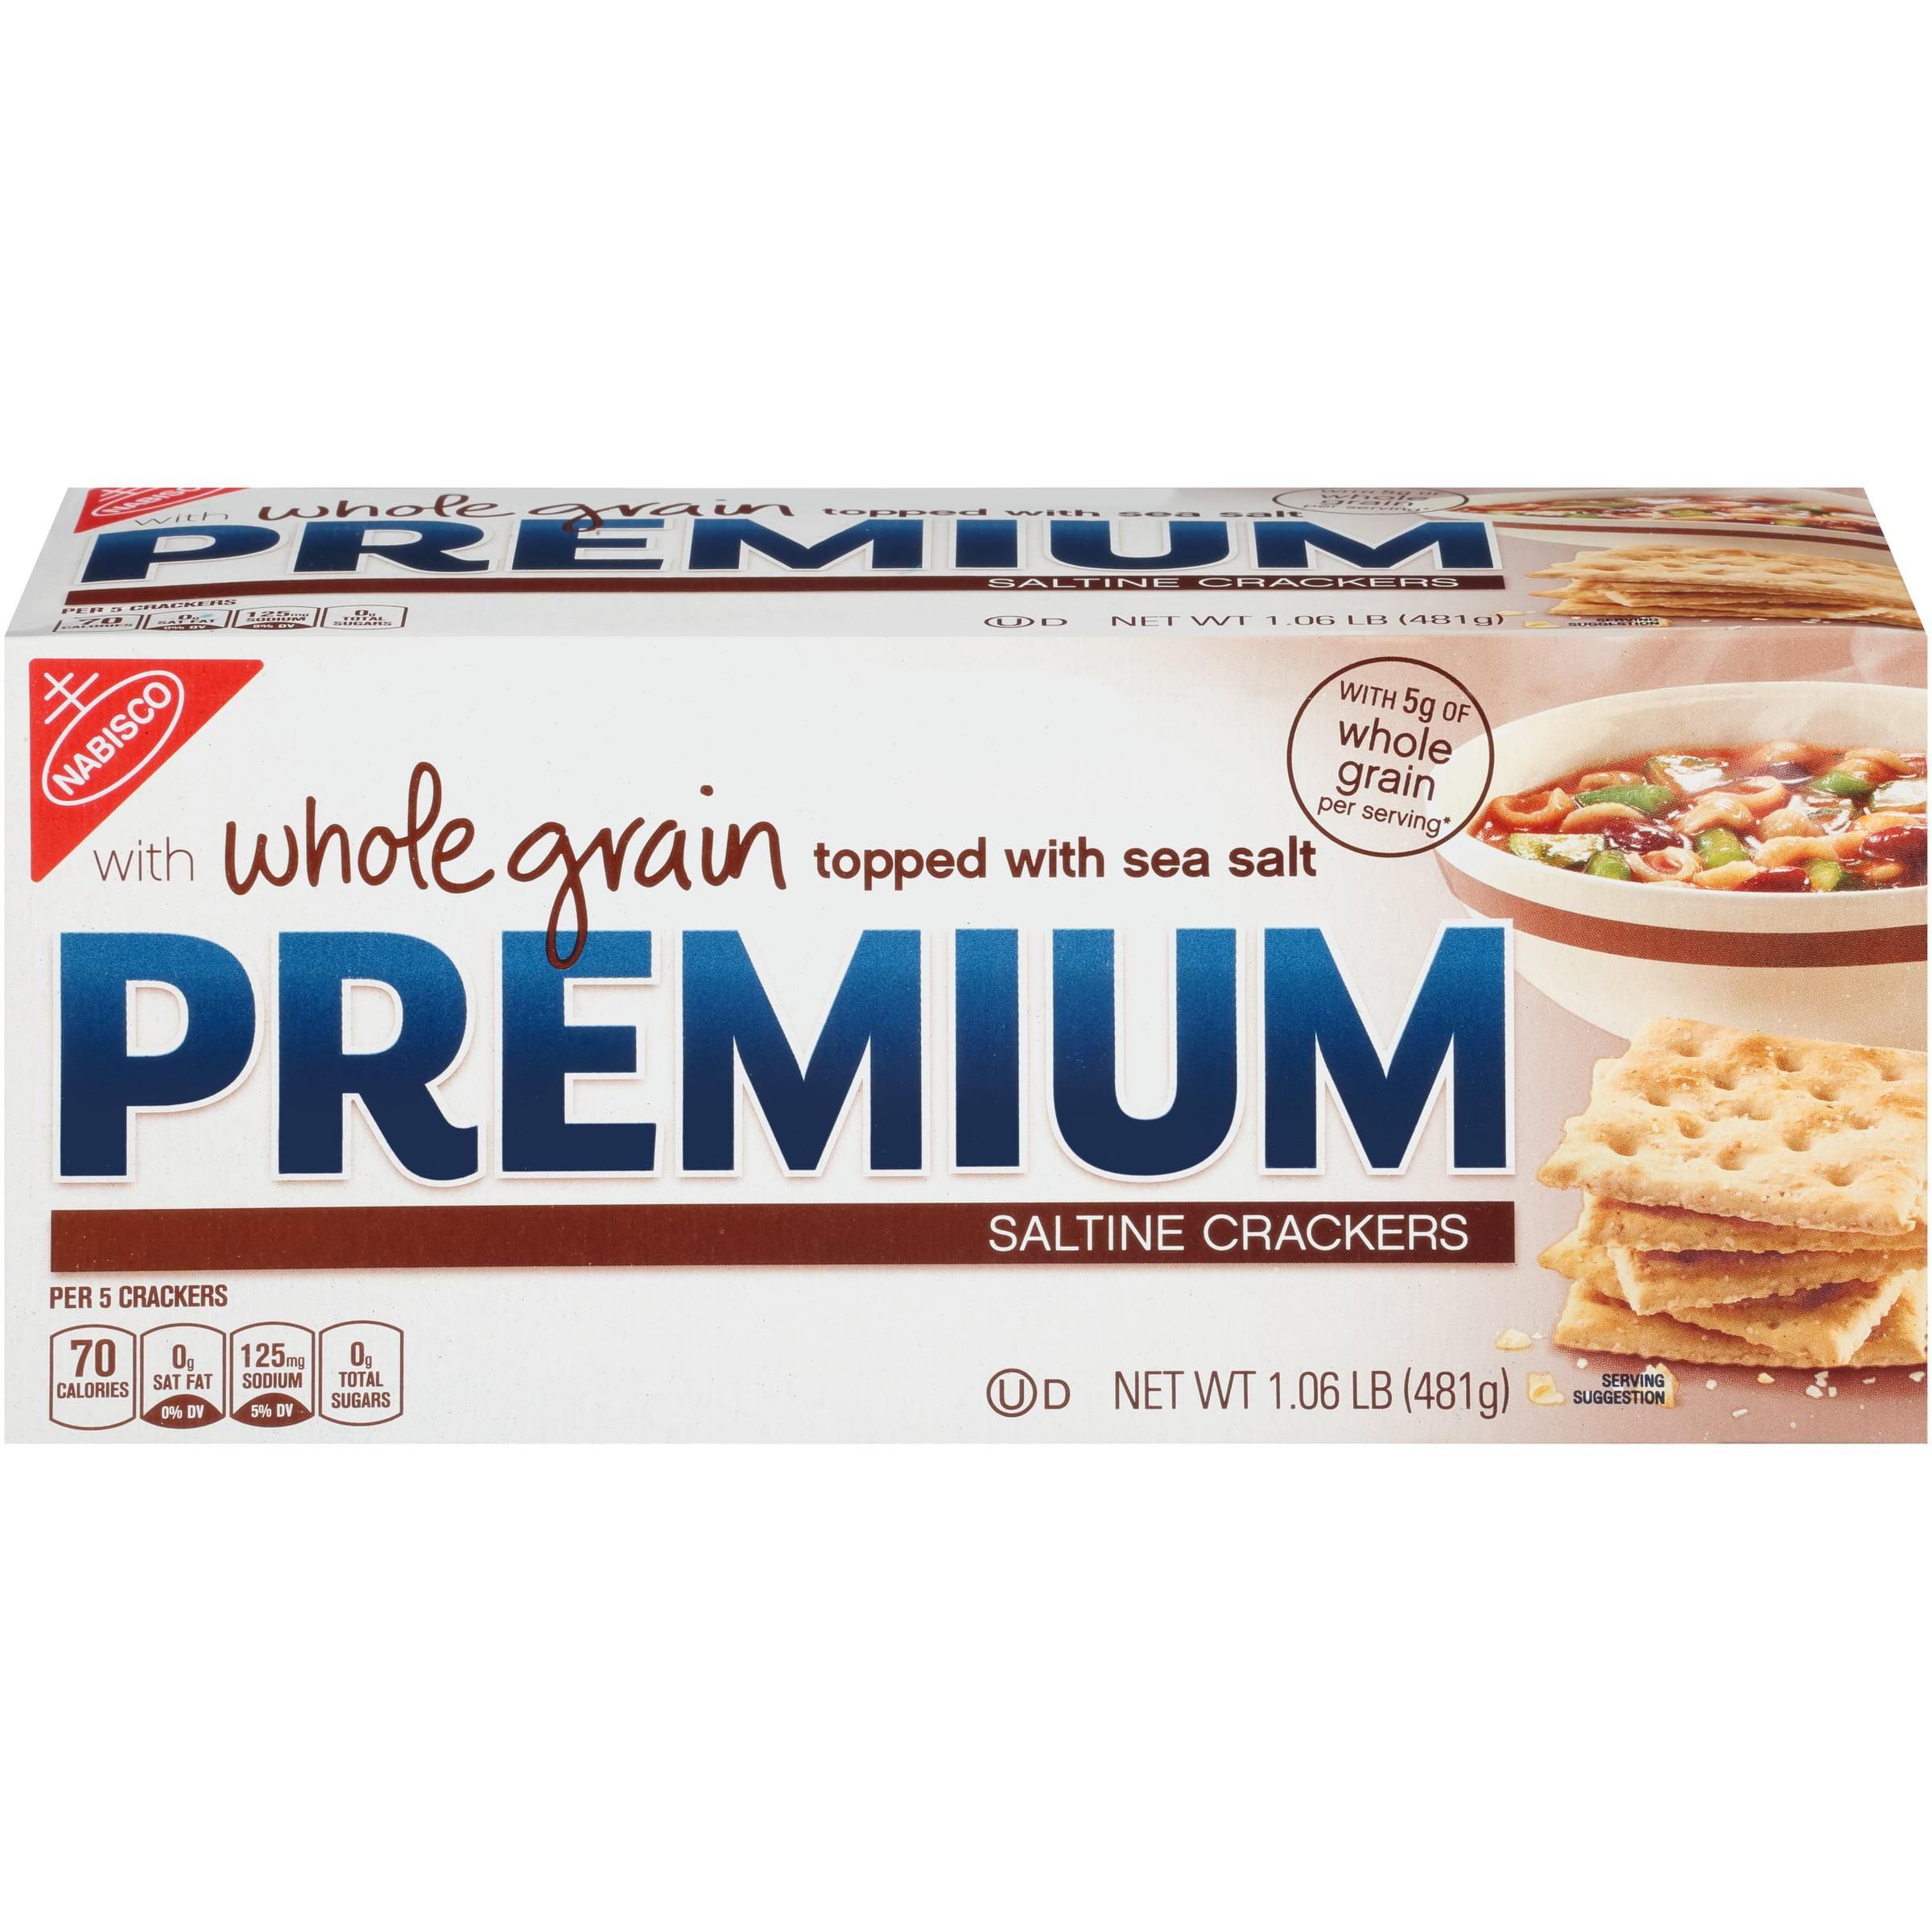 Premium Whole Grain Saltine Crackers, 1.1 Lb.